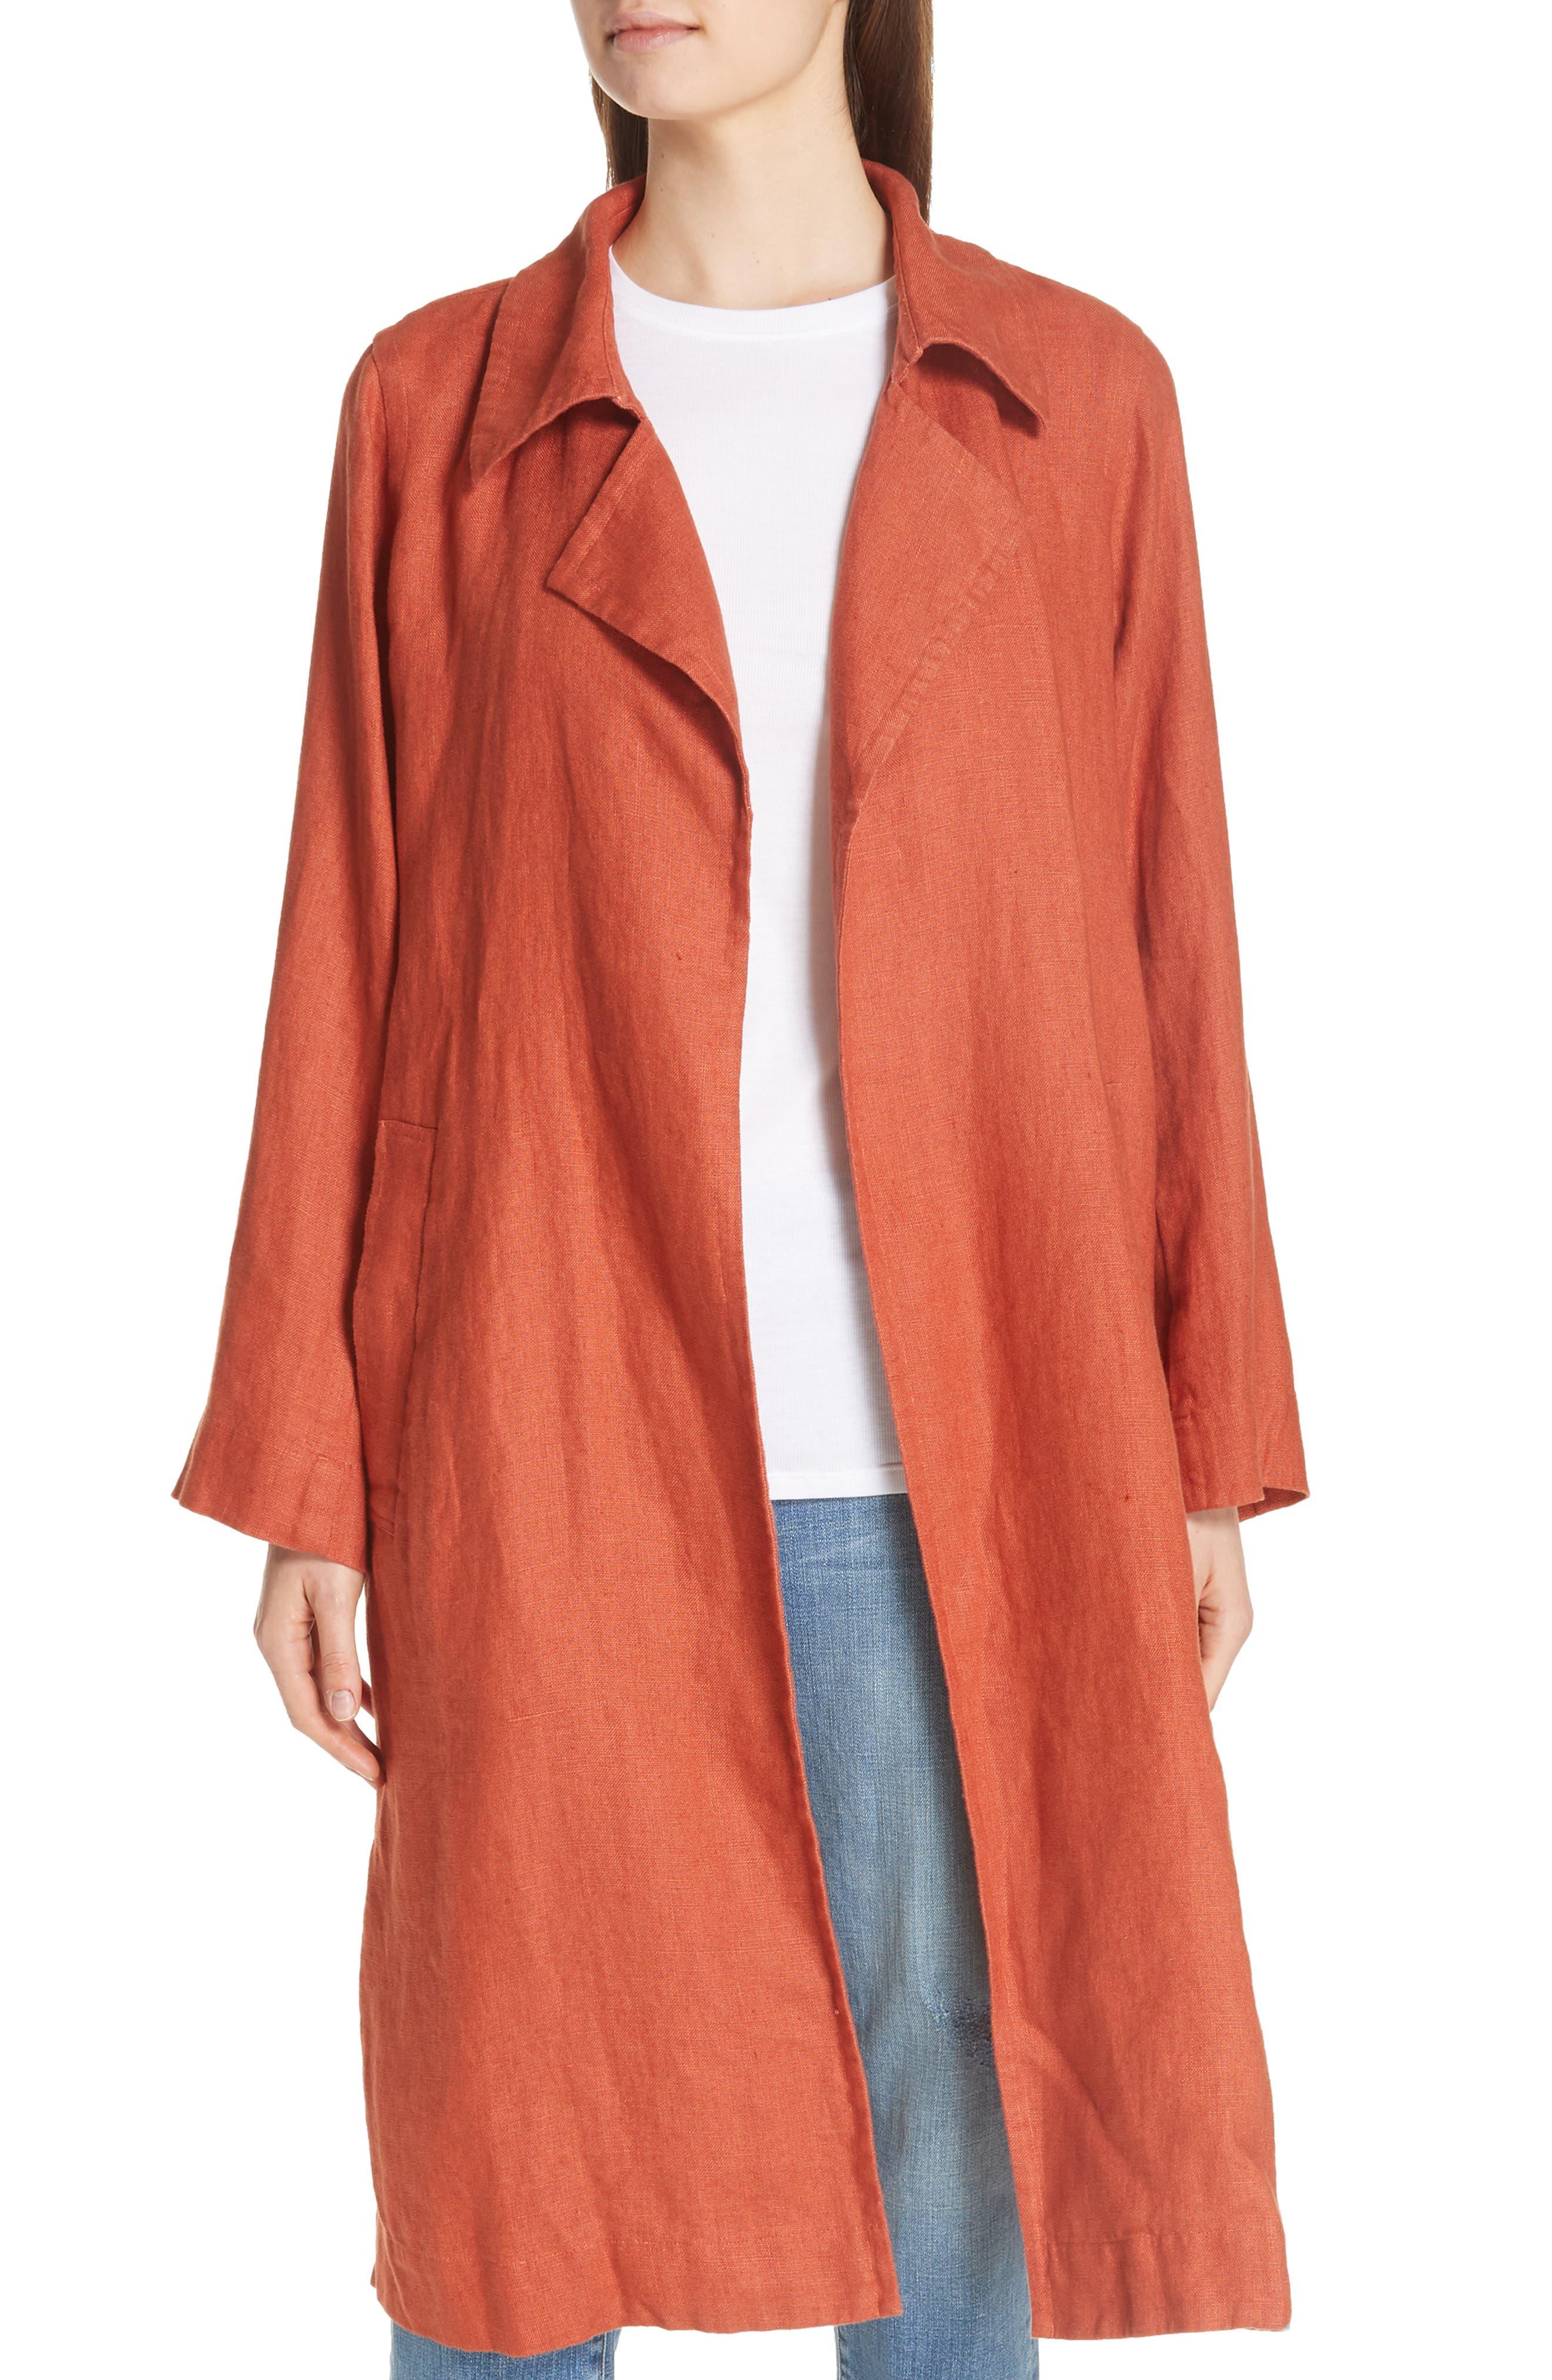 Organic Linen Trench Coat, Main, color, 822